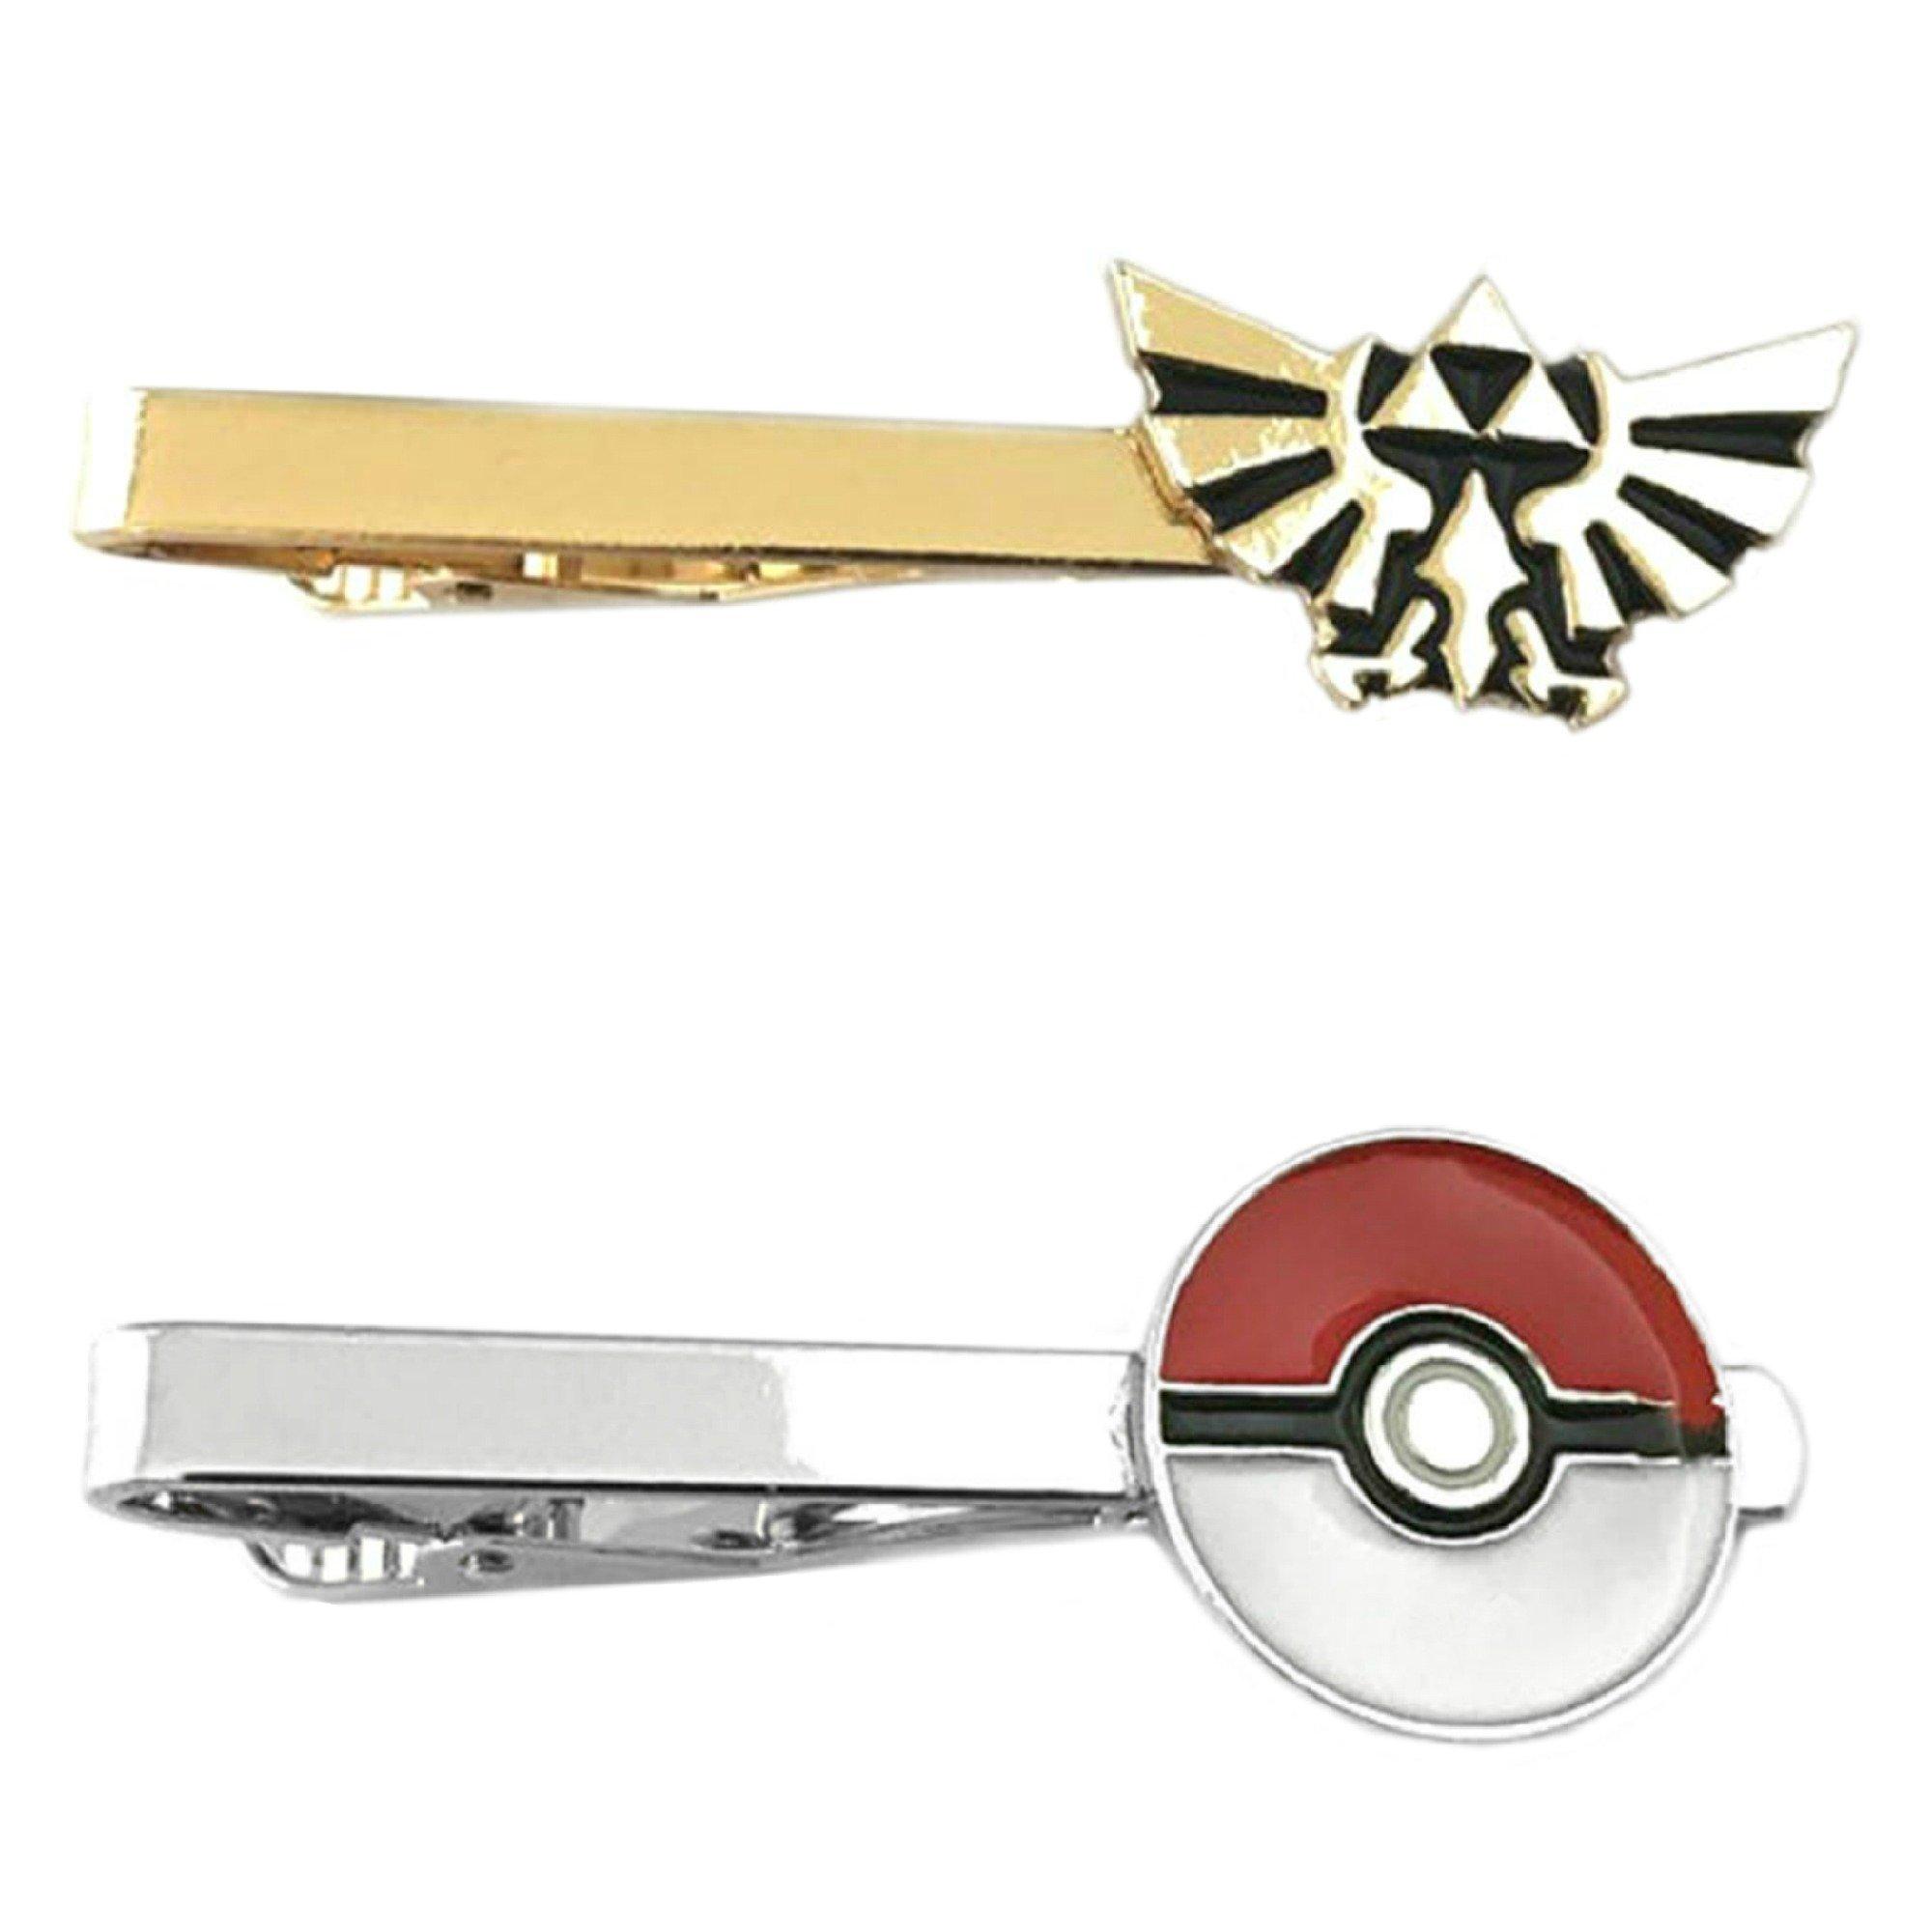 Outlander Video Games - Legend of Zelda Hyrule & PokeMon PokeBall - Tiebar Tie Clasp Set of 2 Wedding Superhero Logo w/Gift Box